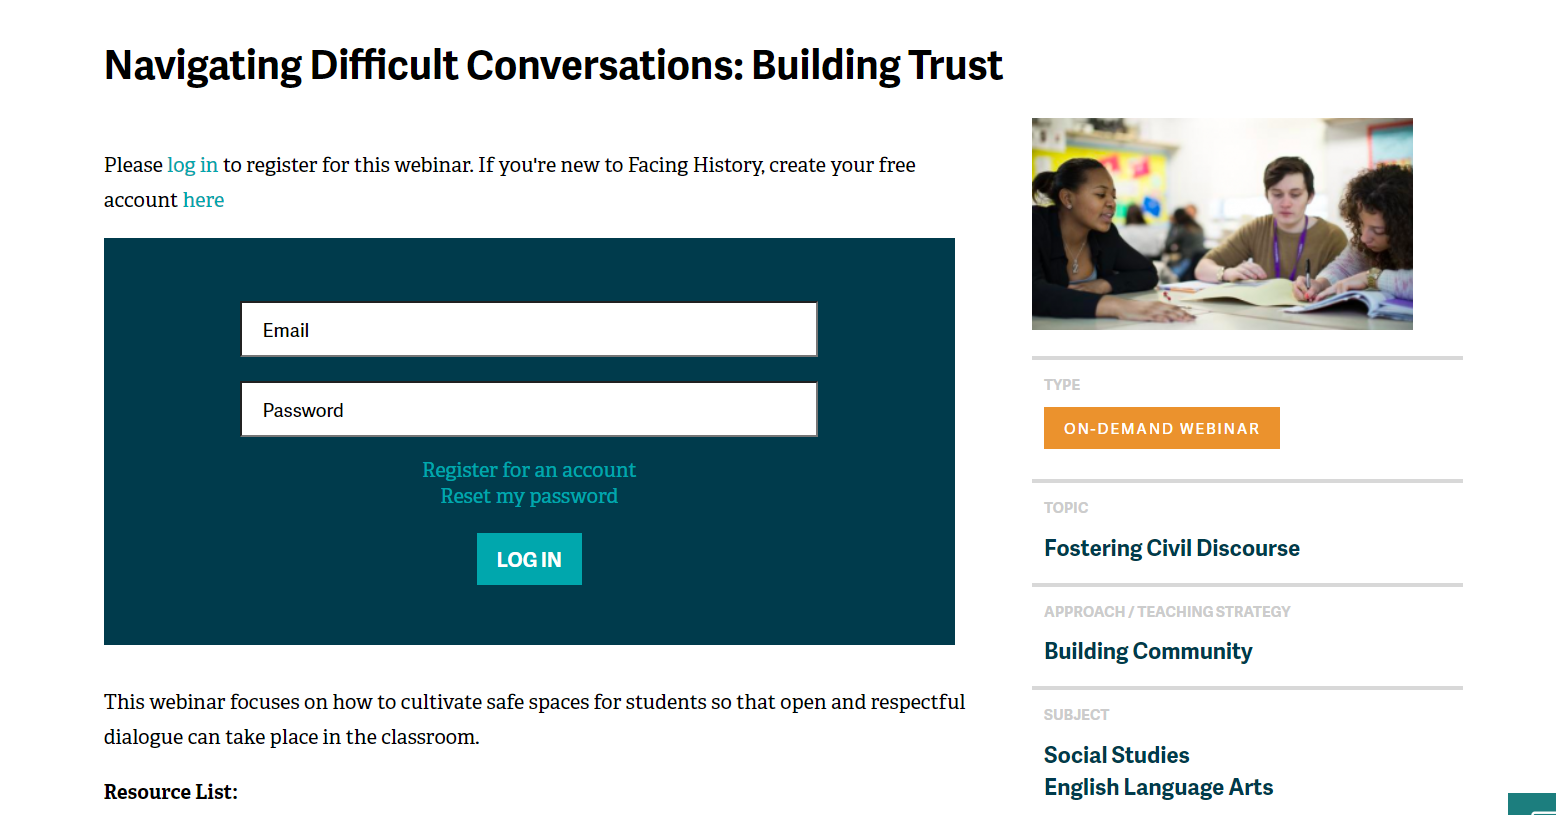 Navigating Difficult Conversations: Building Trust